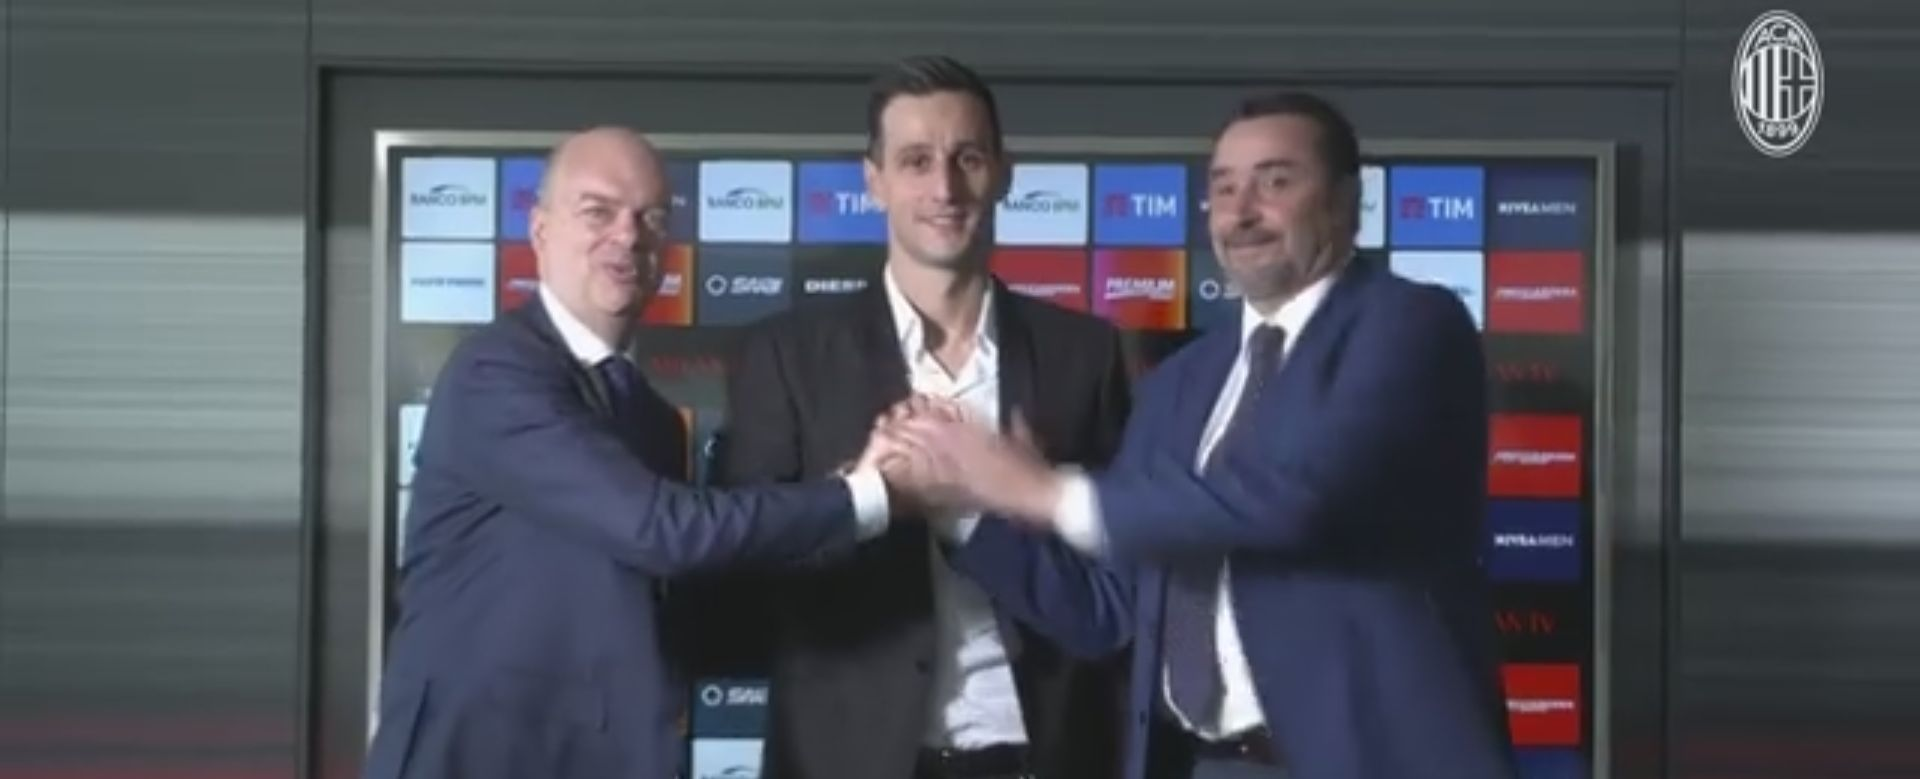 VIDEO: SERIE A Kalinić donio pobjedu Milanu, Strinić i Mandžukić asistenti